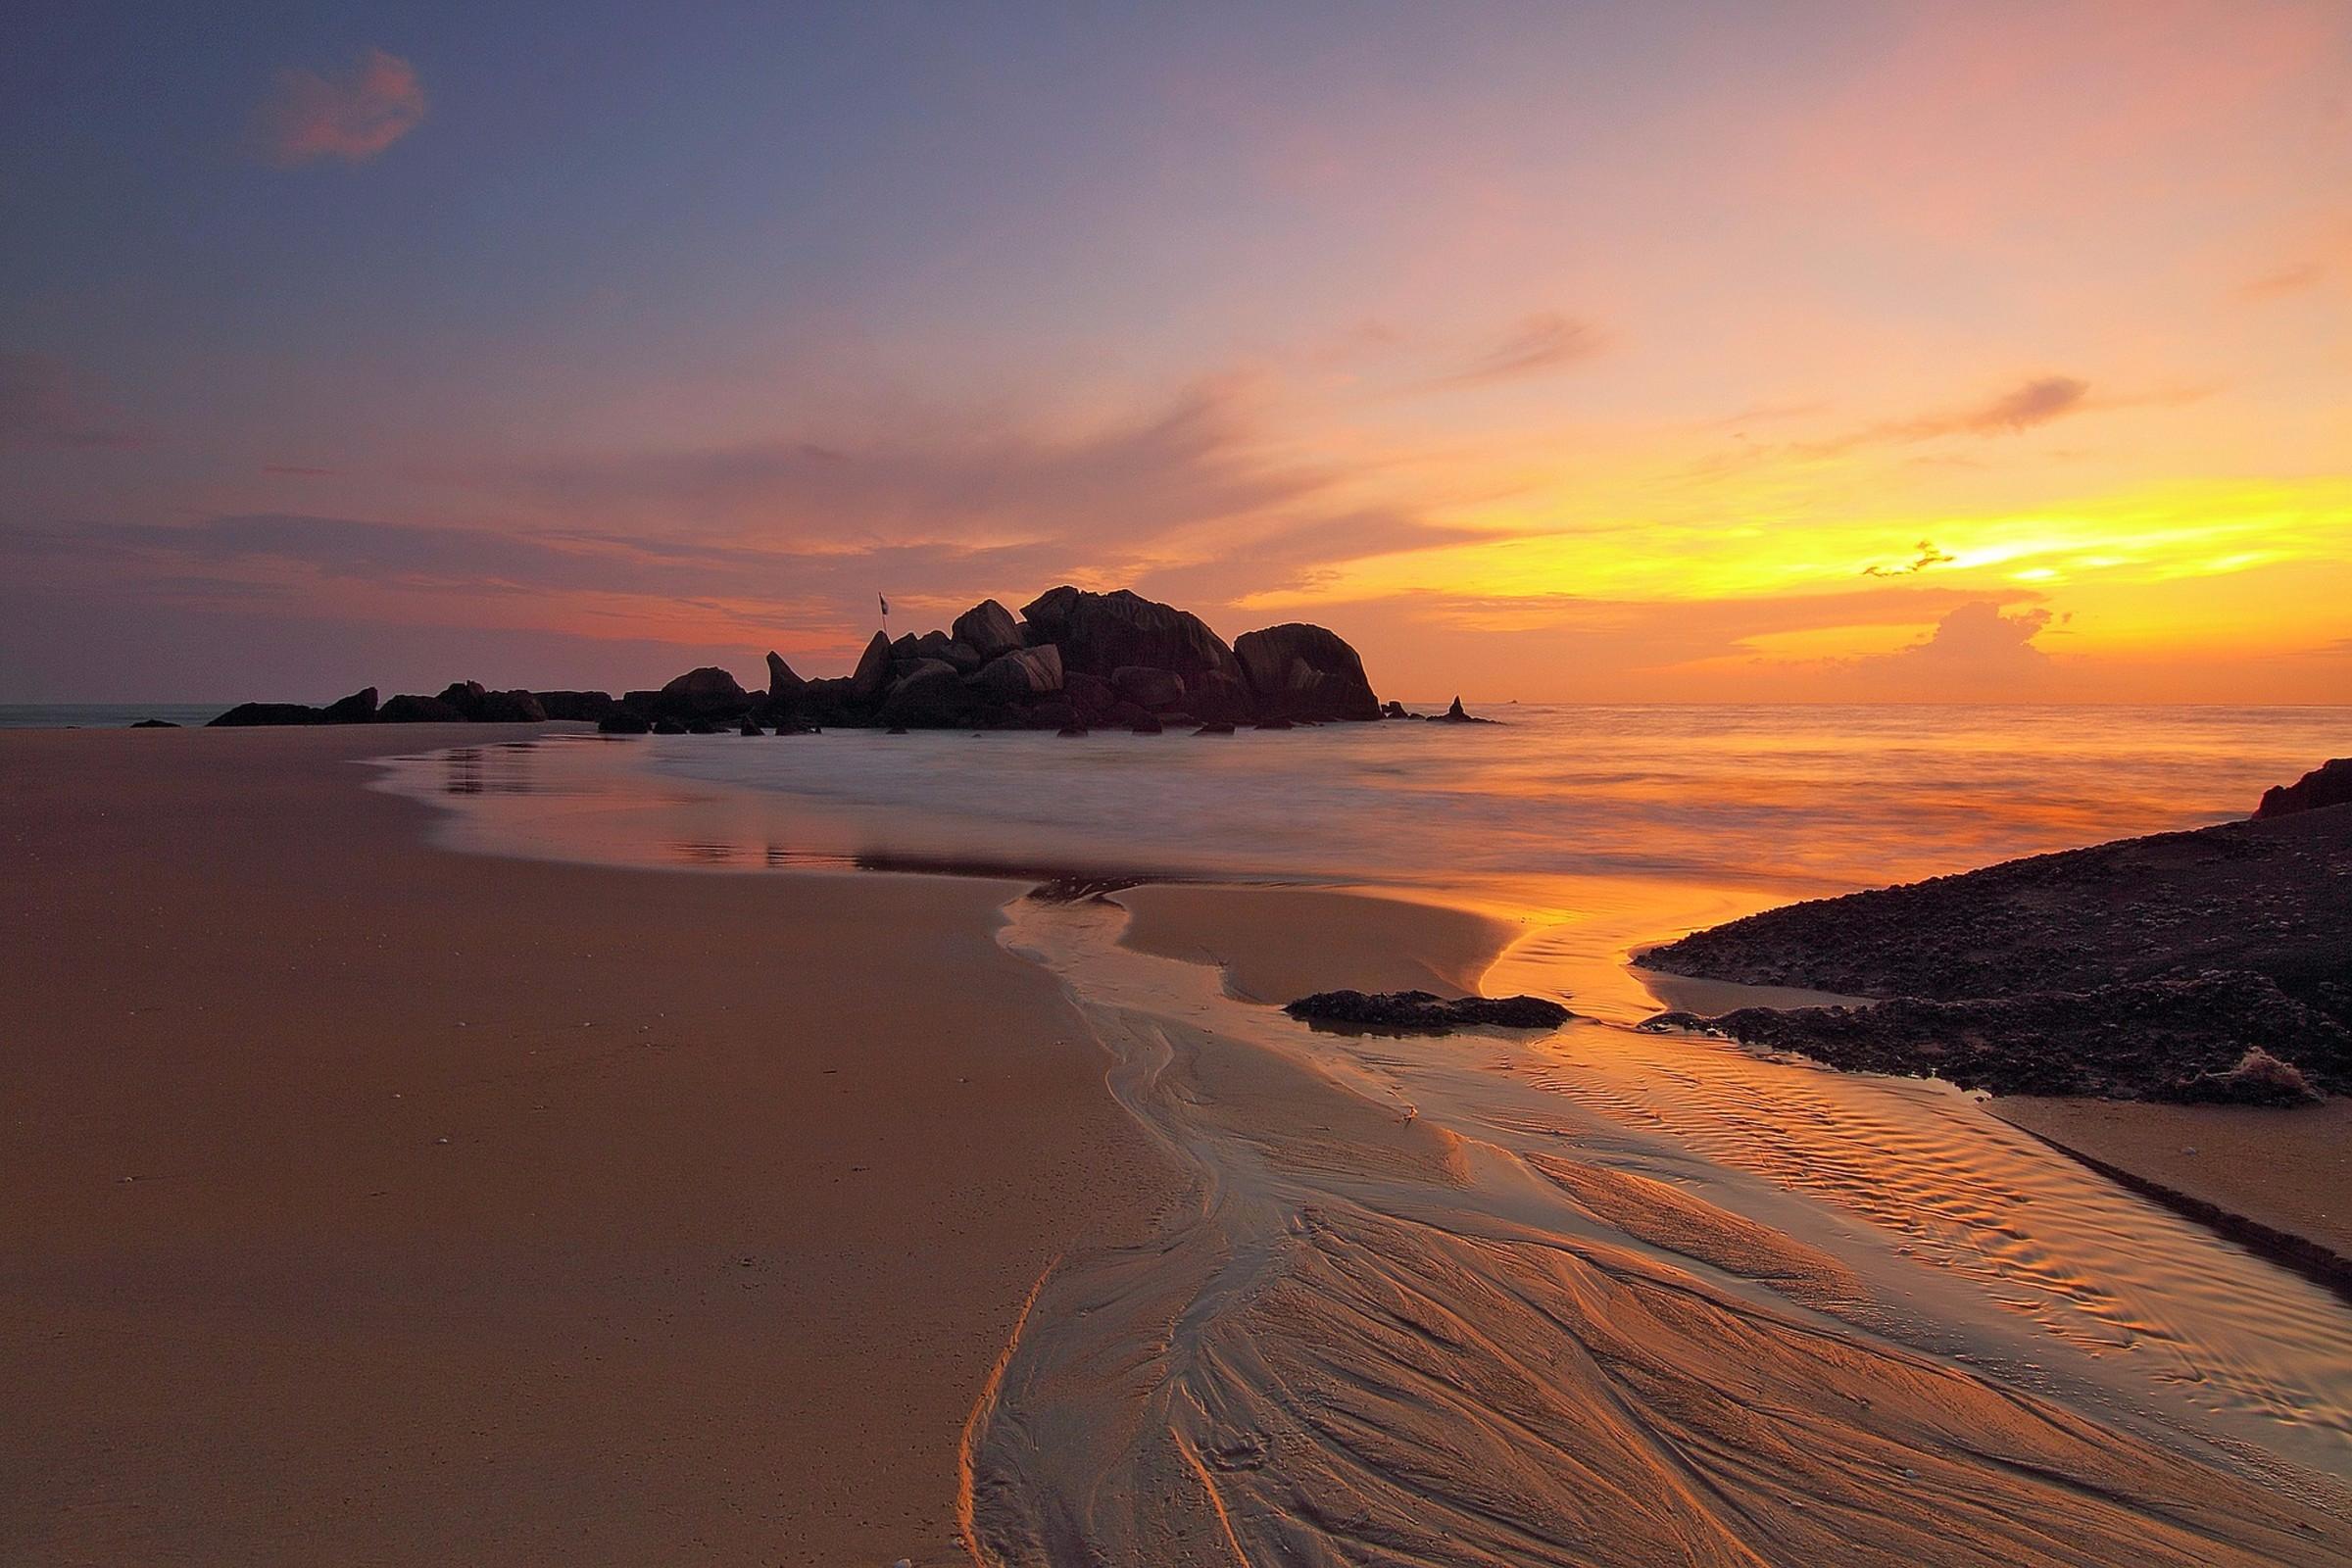 beach sunset waves.jpg